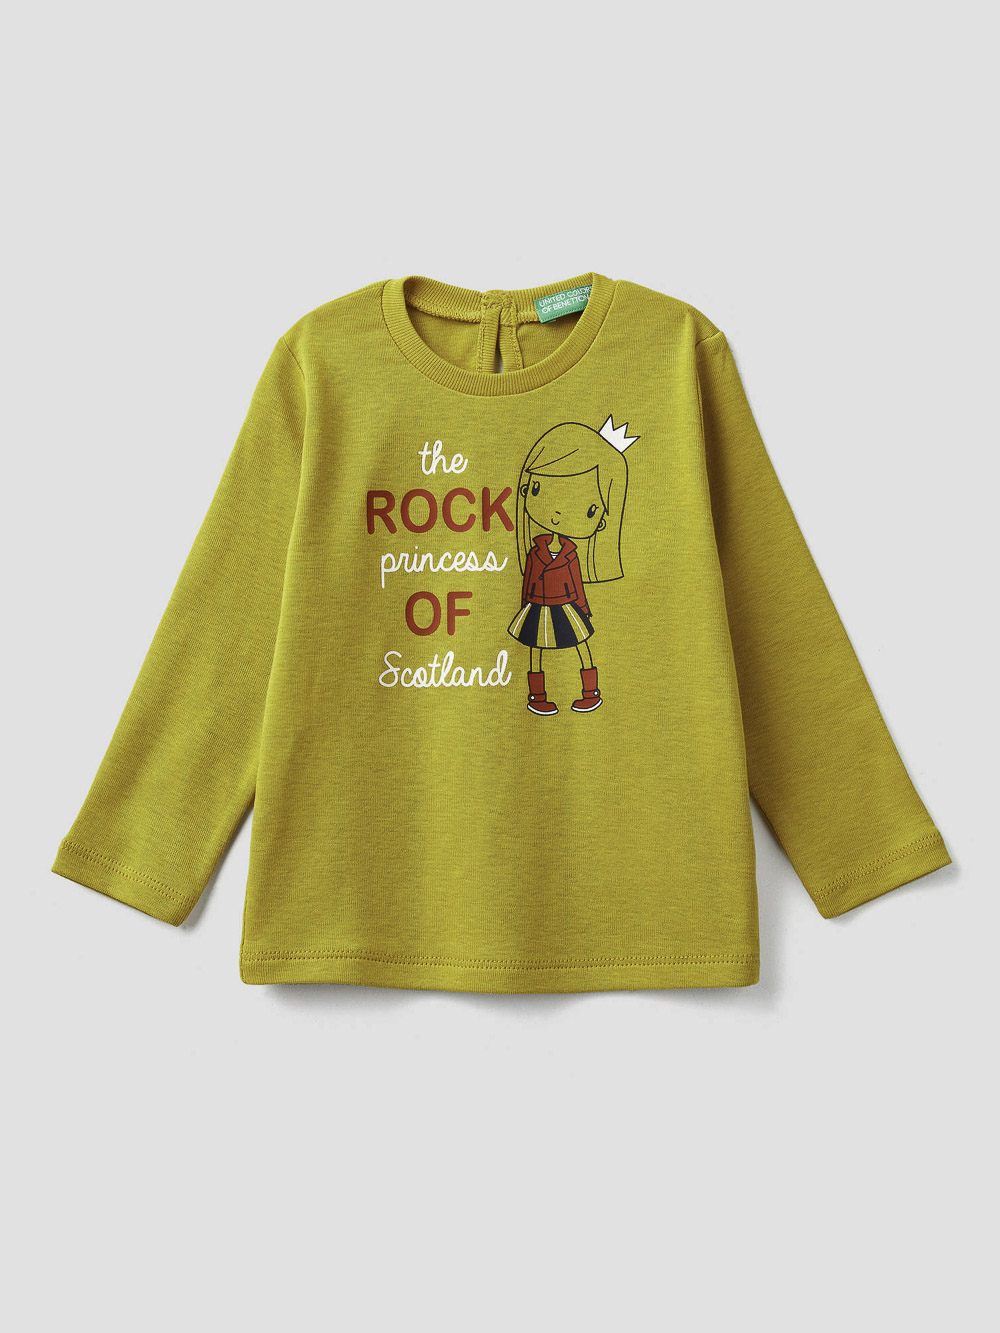 012 BENETTON T-shirt με τύπωμα 3I9WC14S3 20A29U